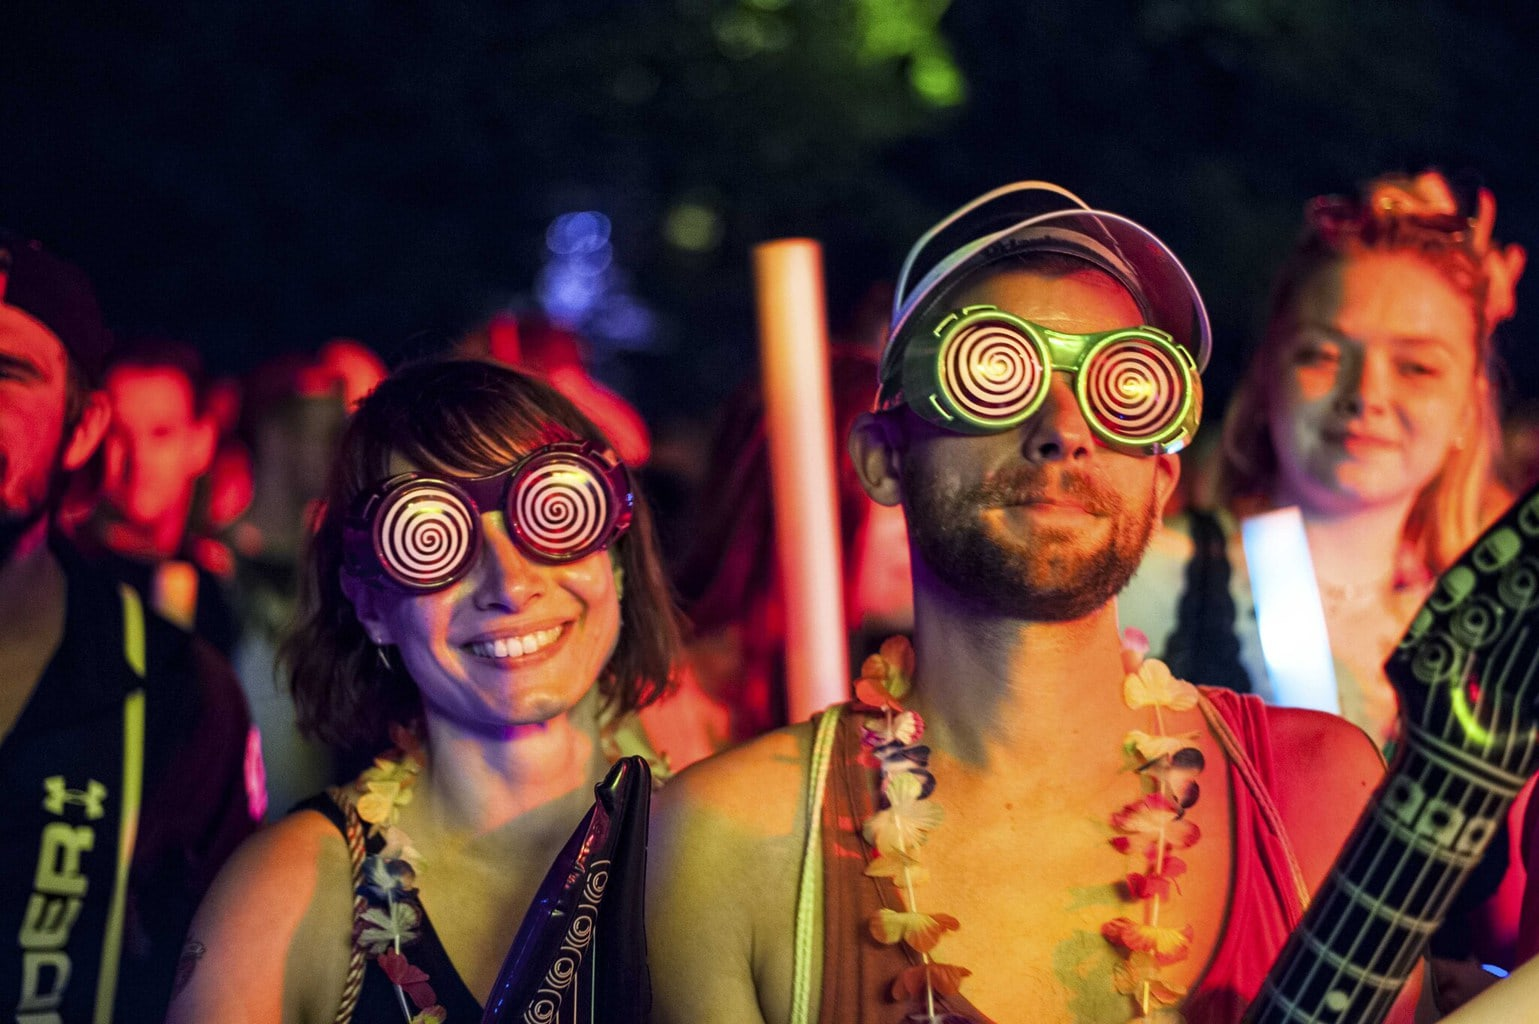 Festivalgangers op het popfestival Juicy Beats in Dortmund